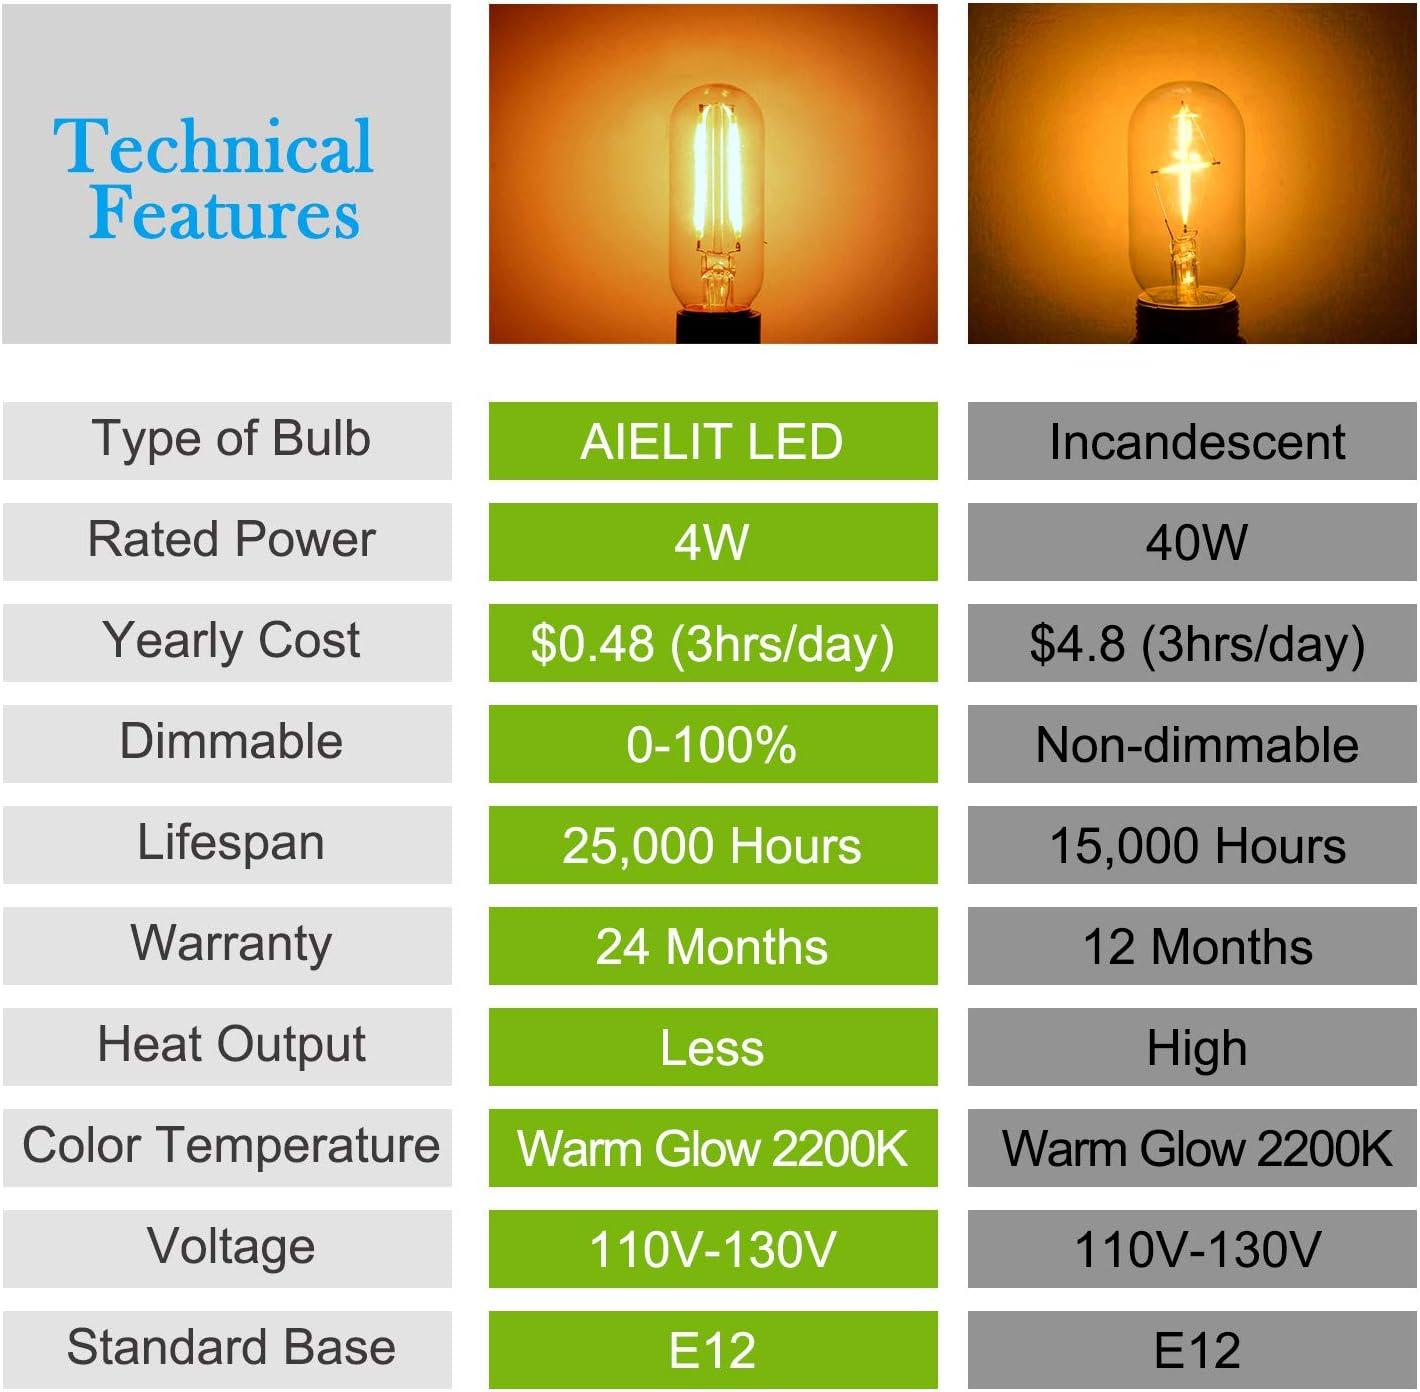 0 100/% 40-Watt Equivalent Rustic T8 Candelabra E12 LED Bulbs AIELIT 4W Tubular LED Light Bulb for Bar Restaurant Farmhouse Industrial Kitchen Lighting Amber Warm 2200K Clear Dimmable 8-Pack